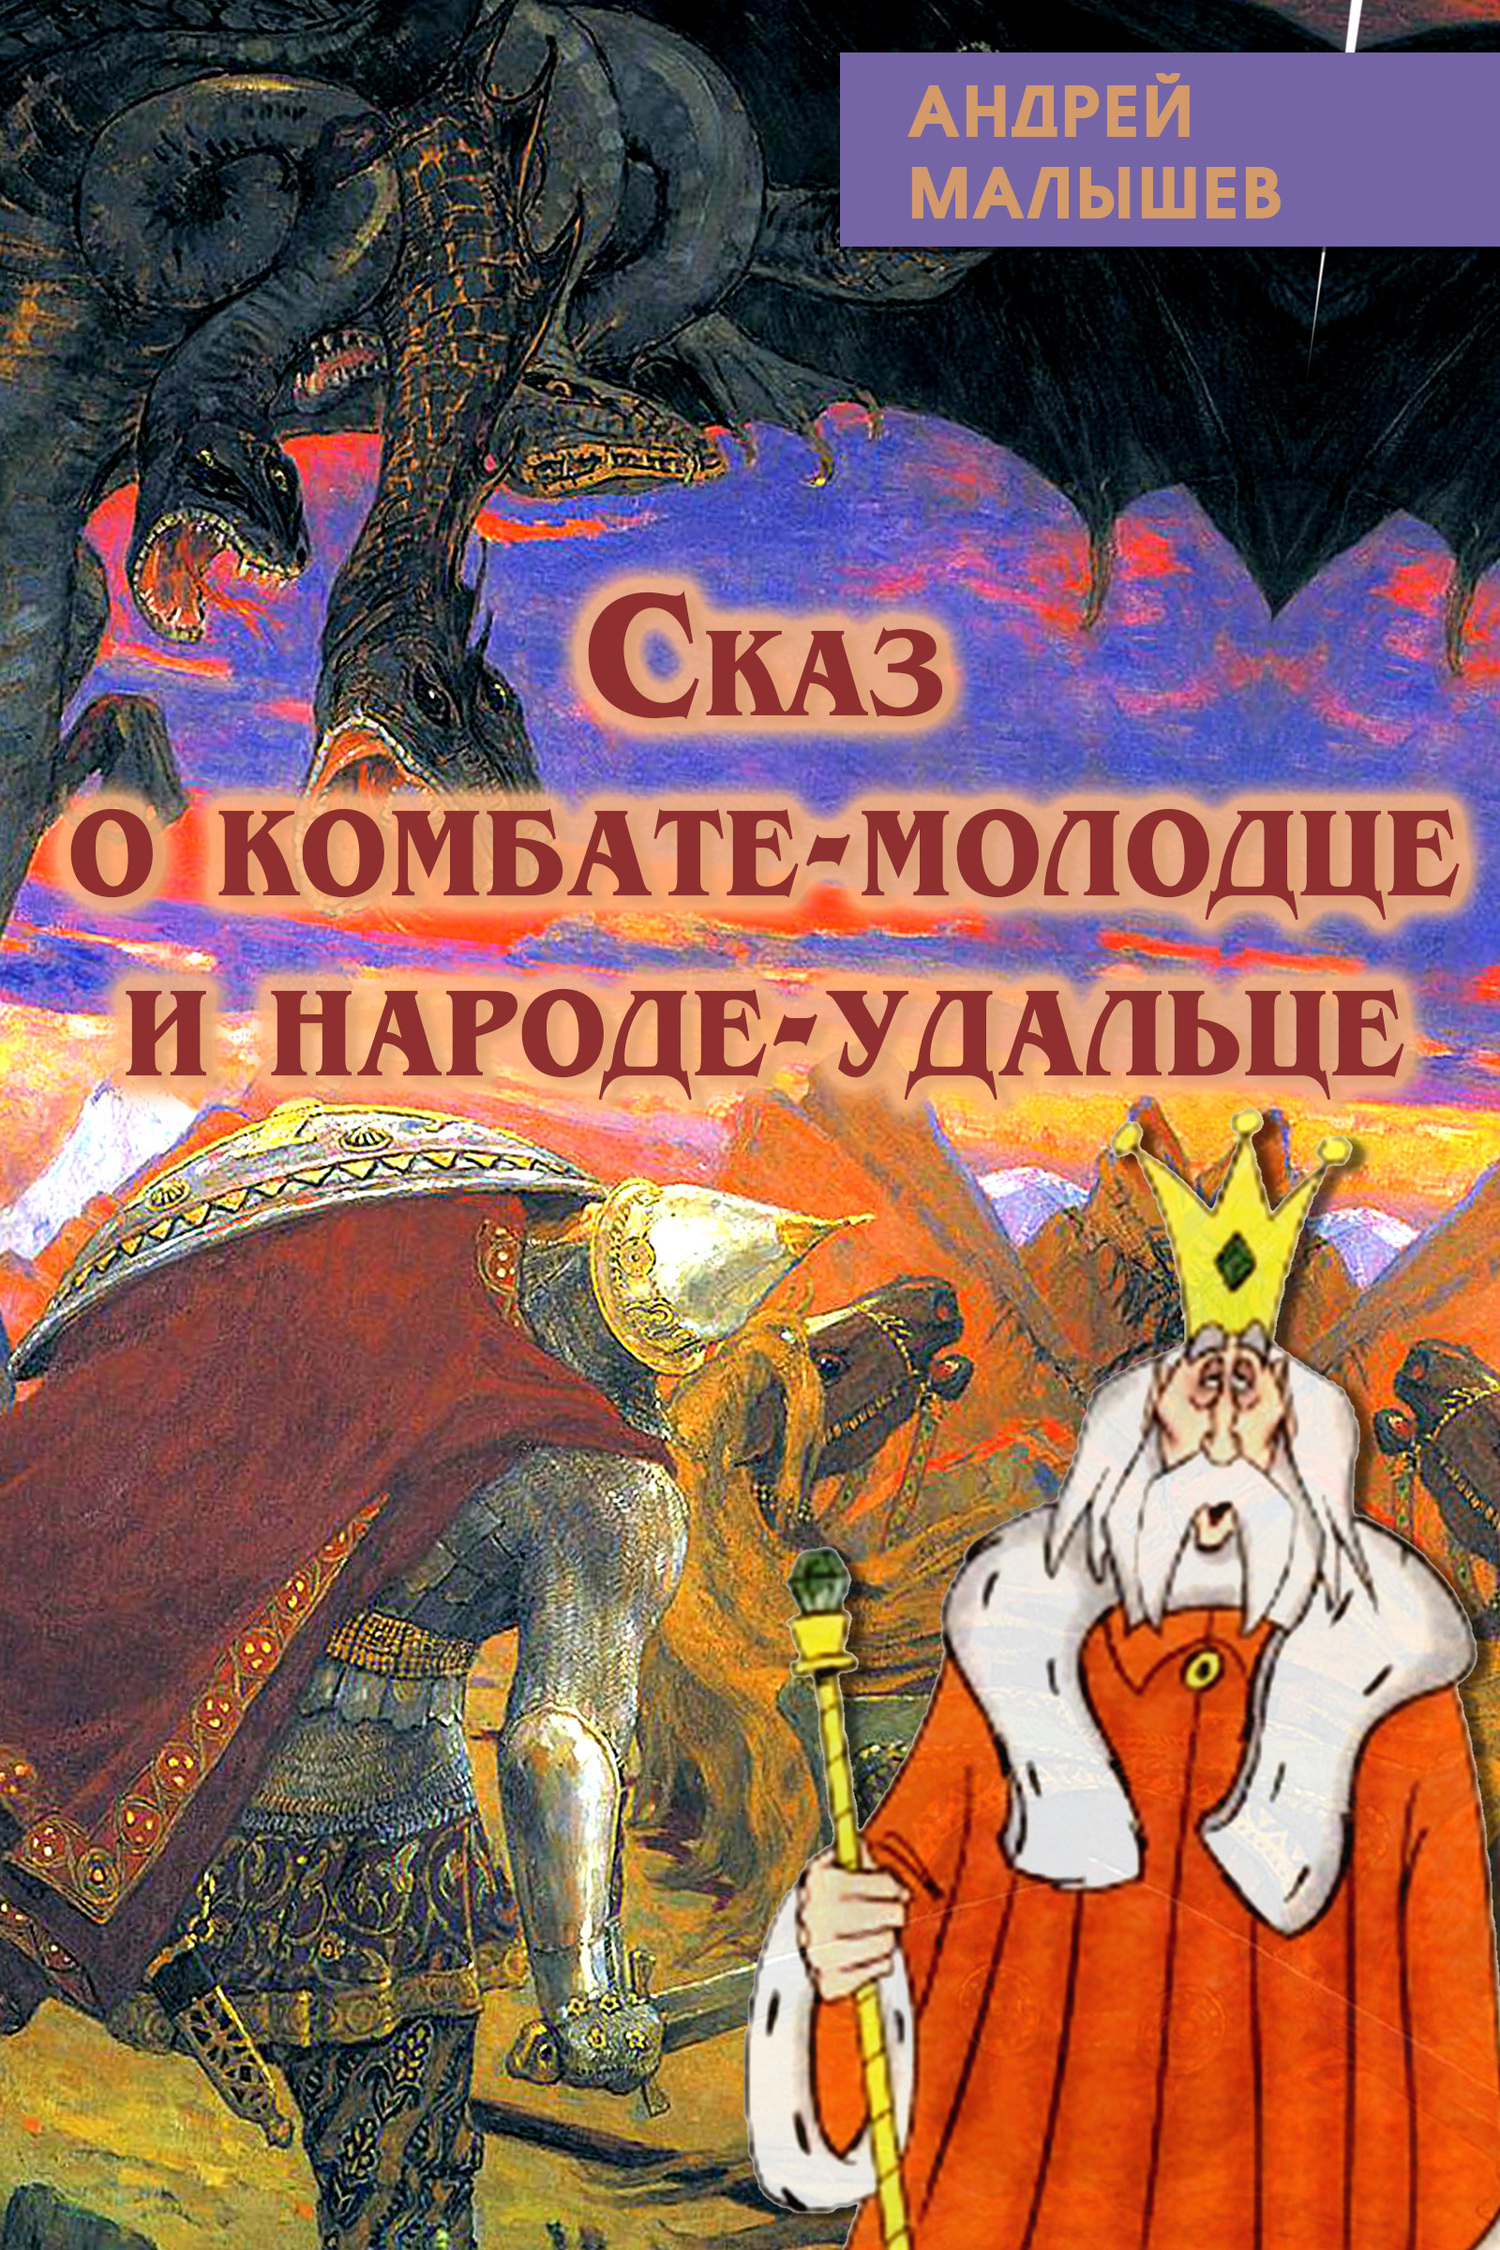 Сказ о комбате-молодце и народе-удальце